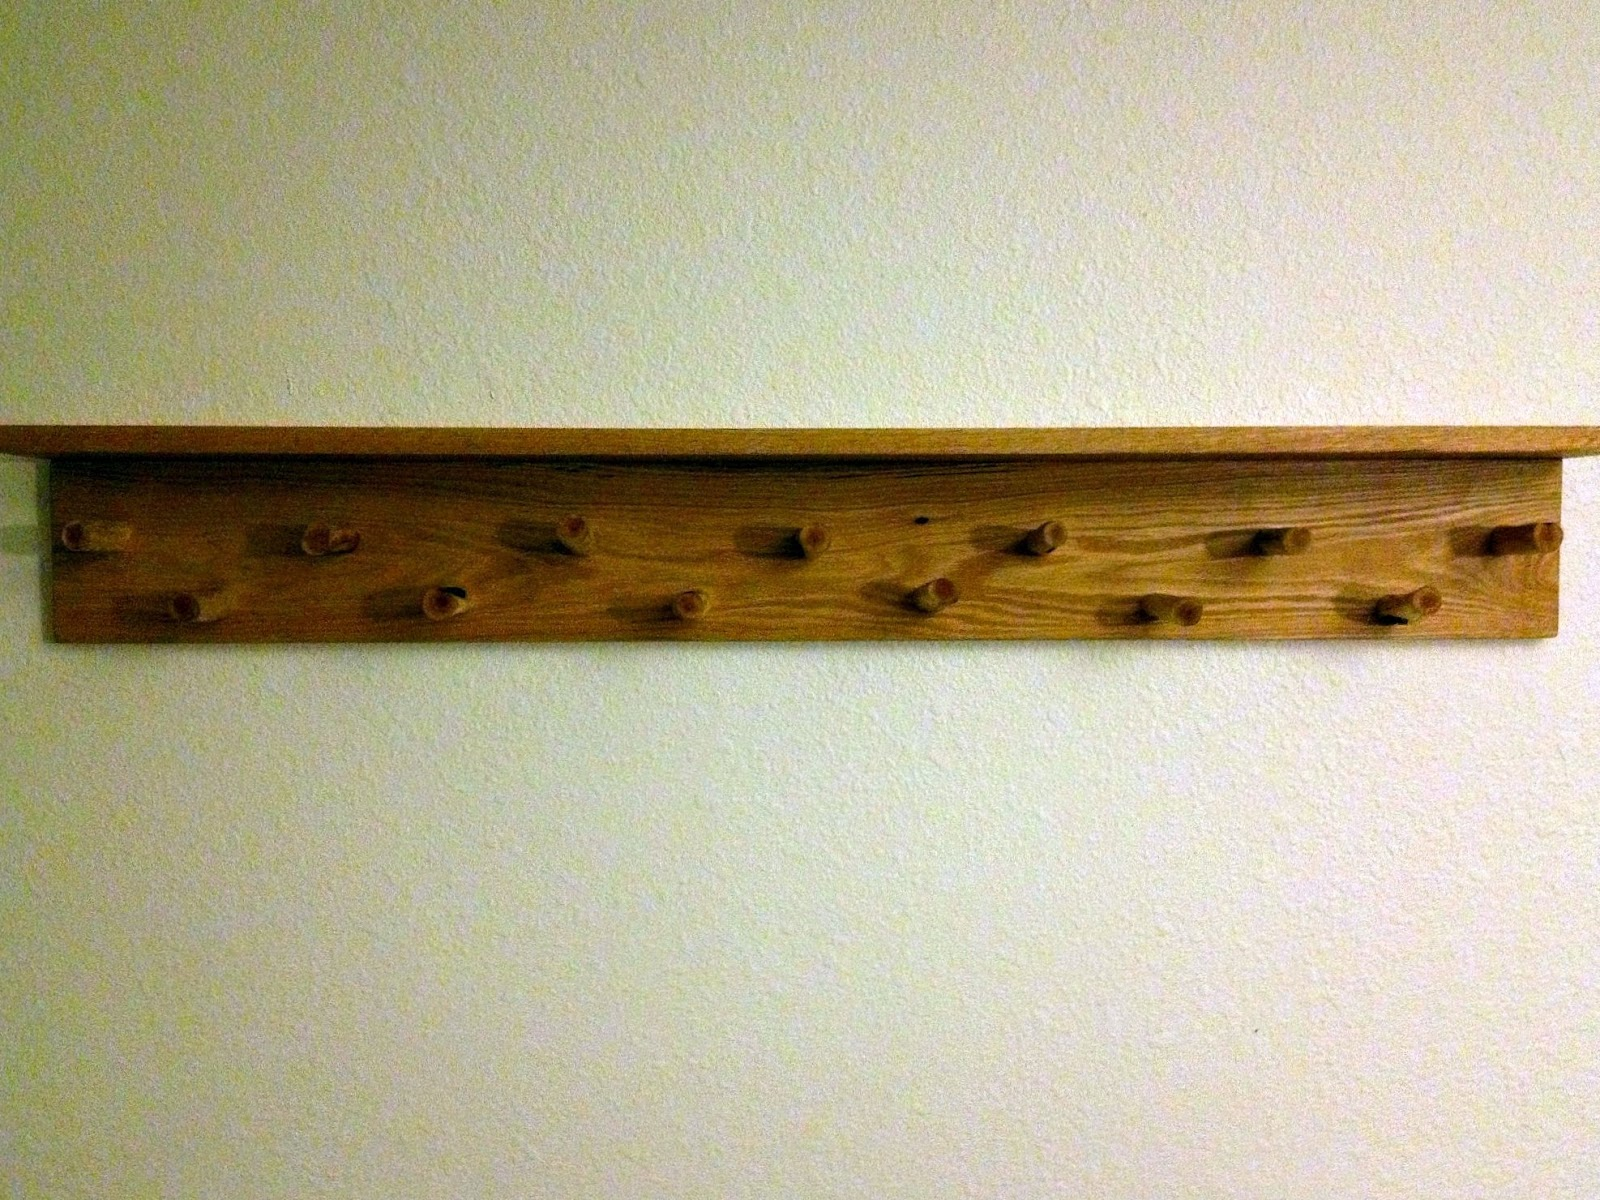 The Modern DIY Life: DIY Wall Hanging Coat Rack